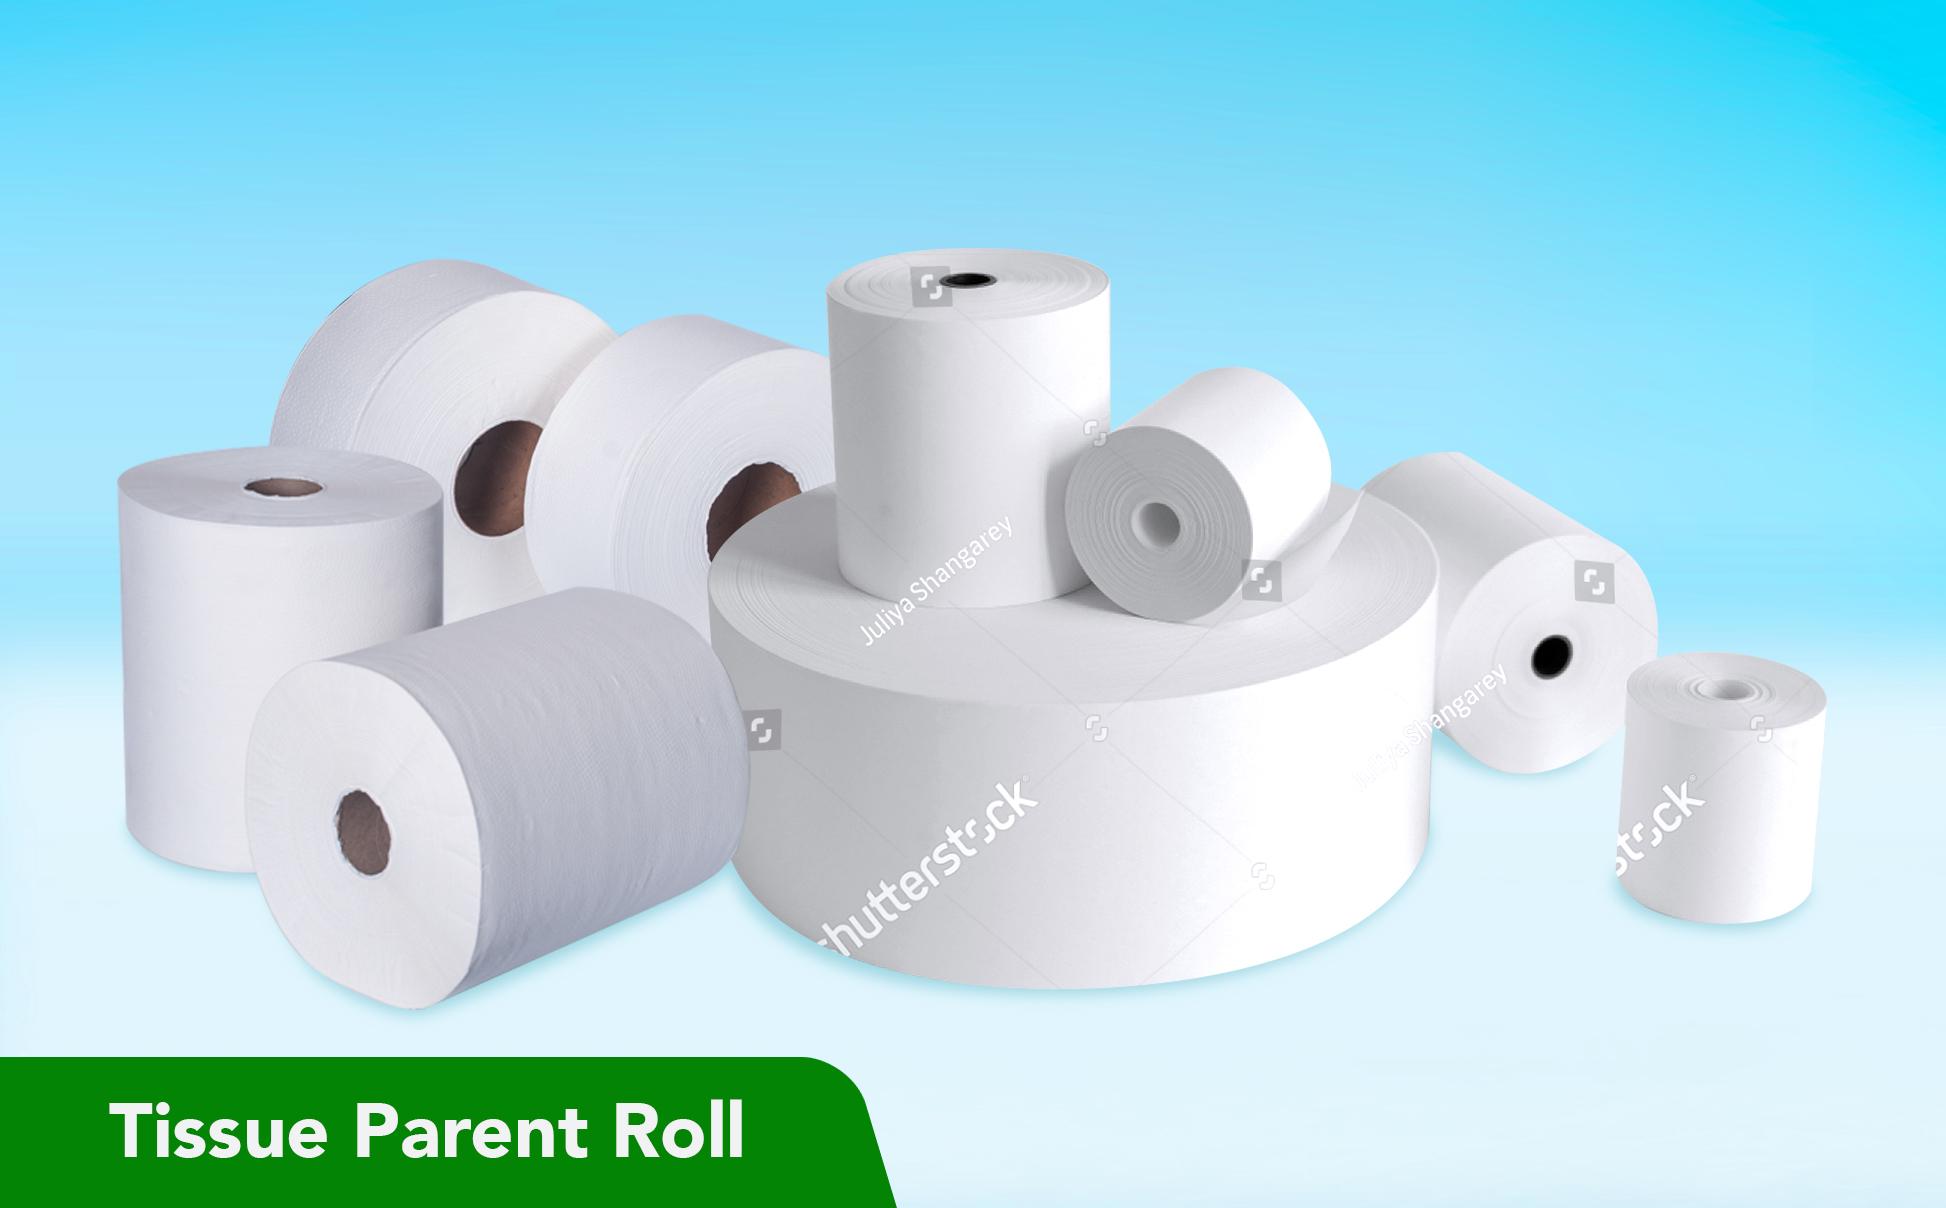 Tissue Parent Roll